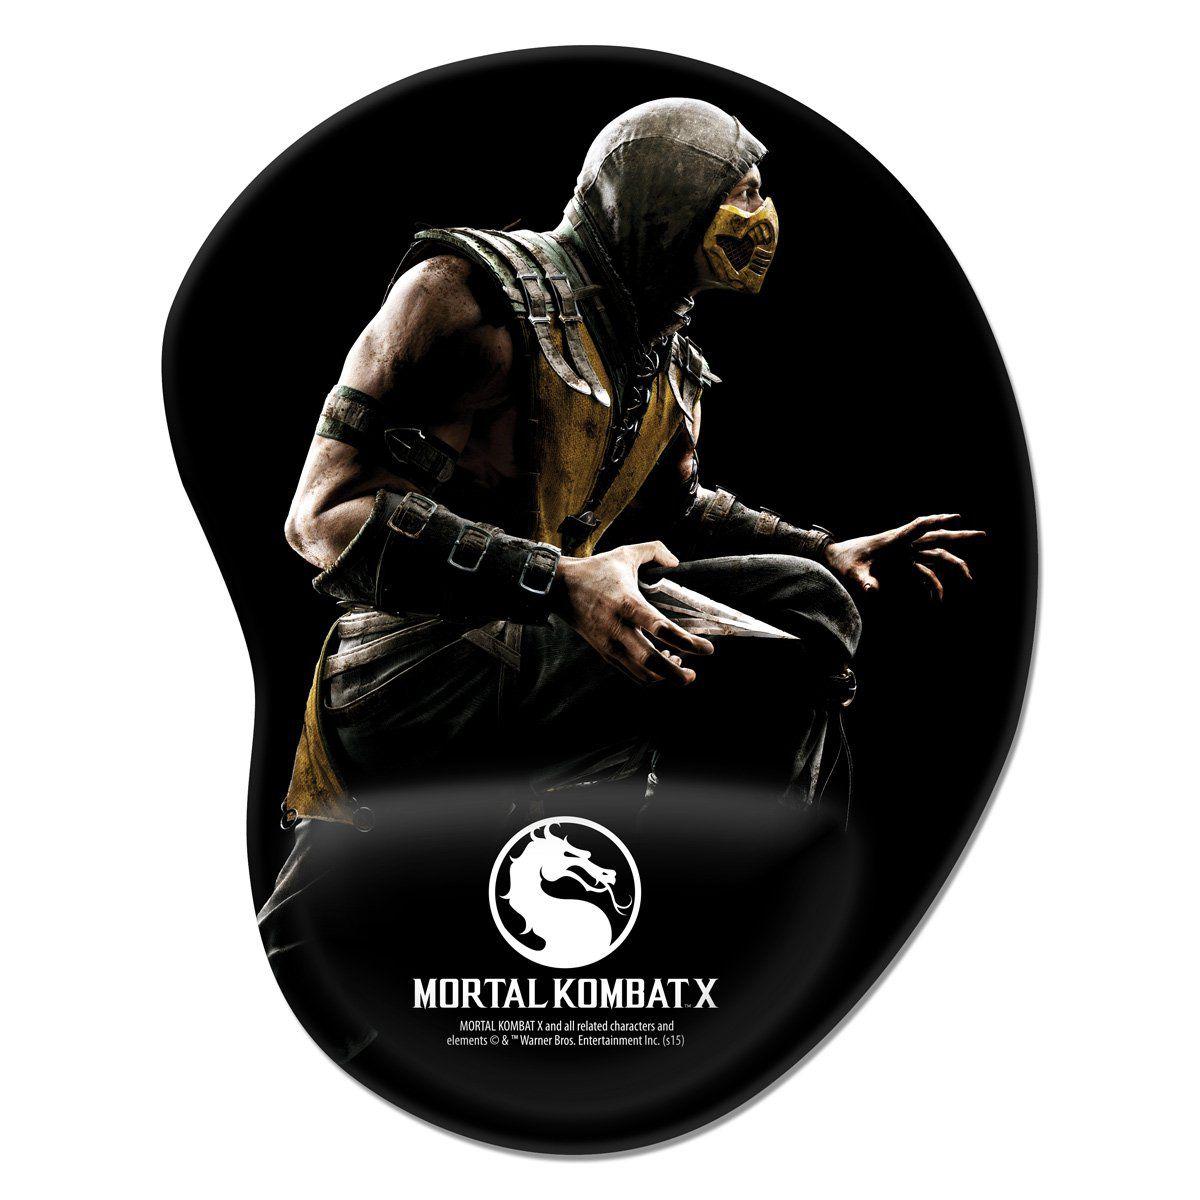 Mousepad Mortal Kombat X Capa  - bandUP Store Marketplace